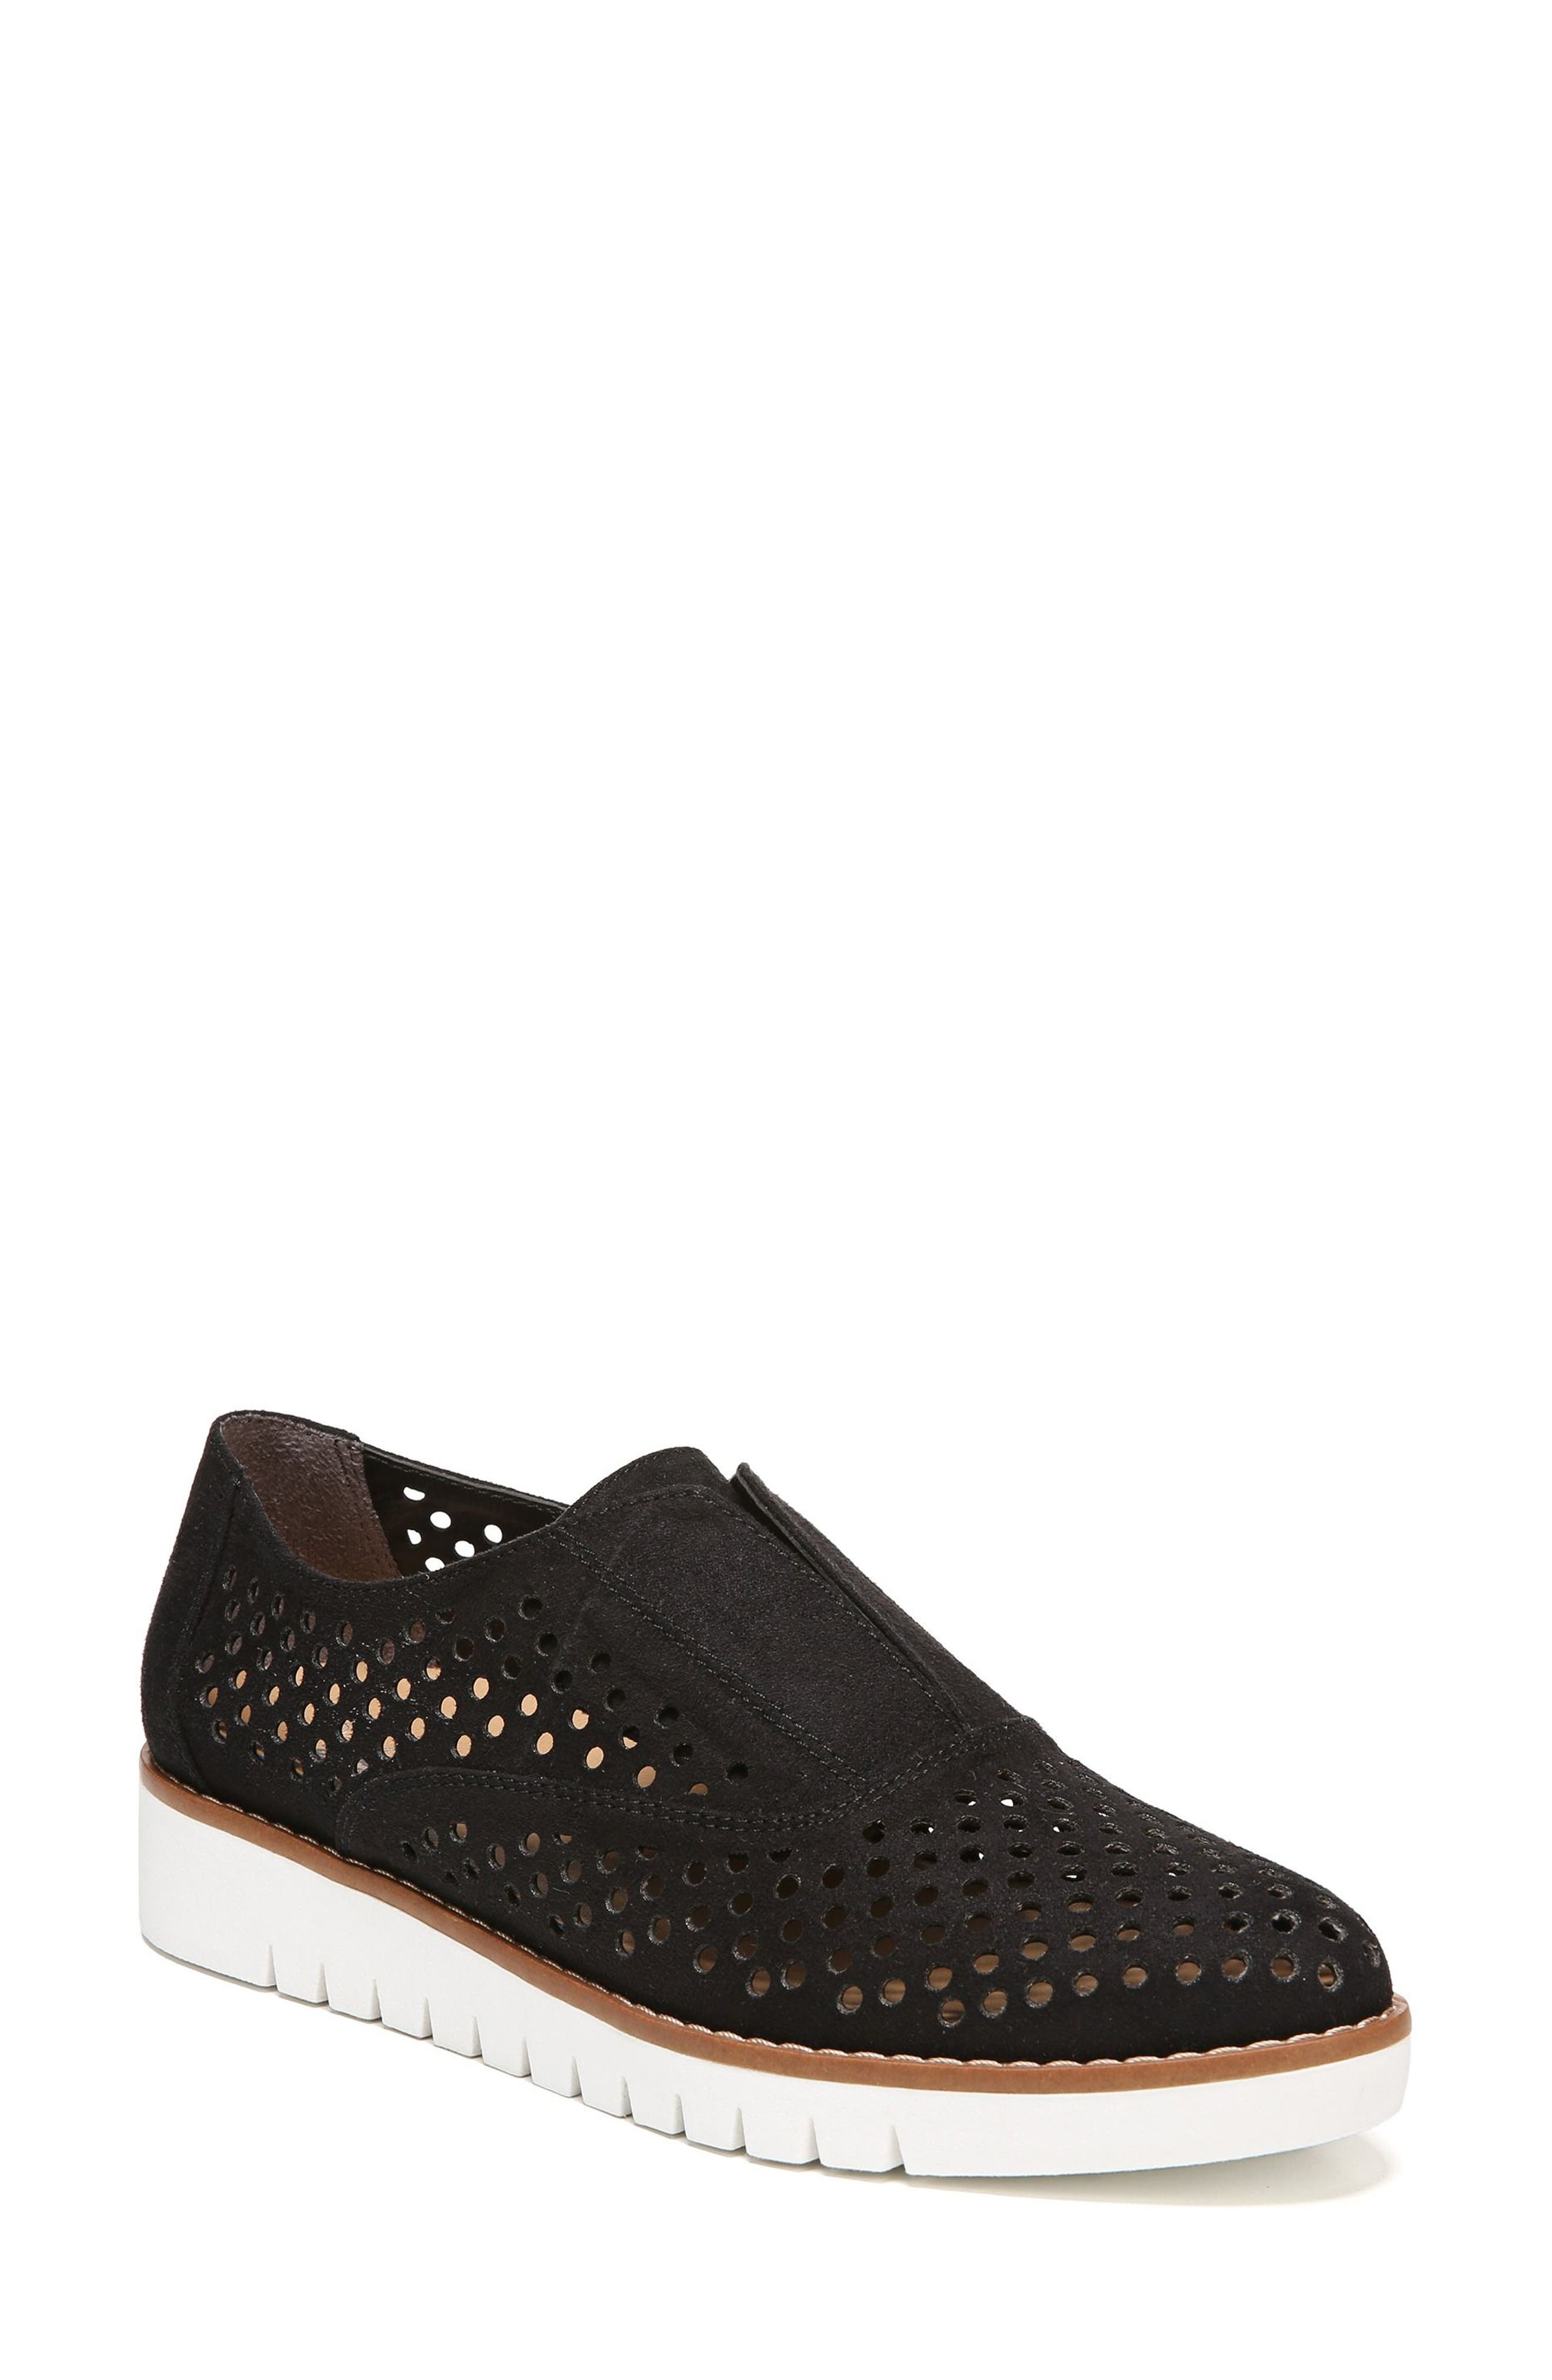 Improve Slip-On Sneaker,                             Main thumbnail 1, color,                             Black Fabric